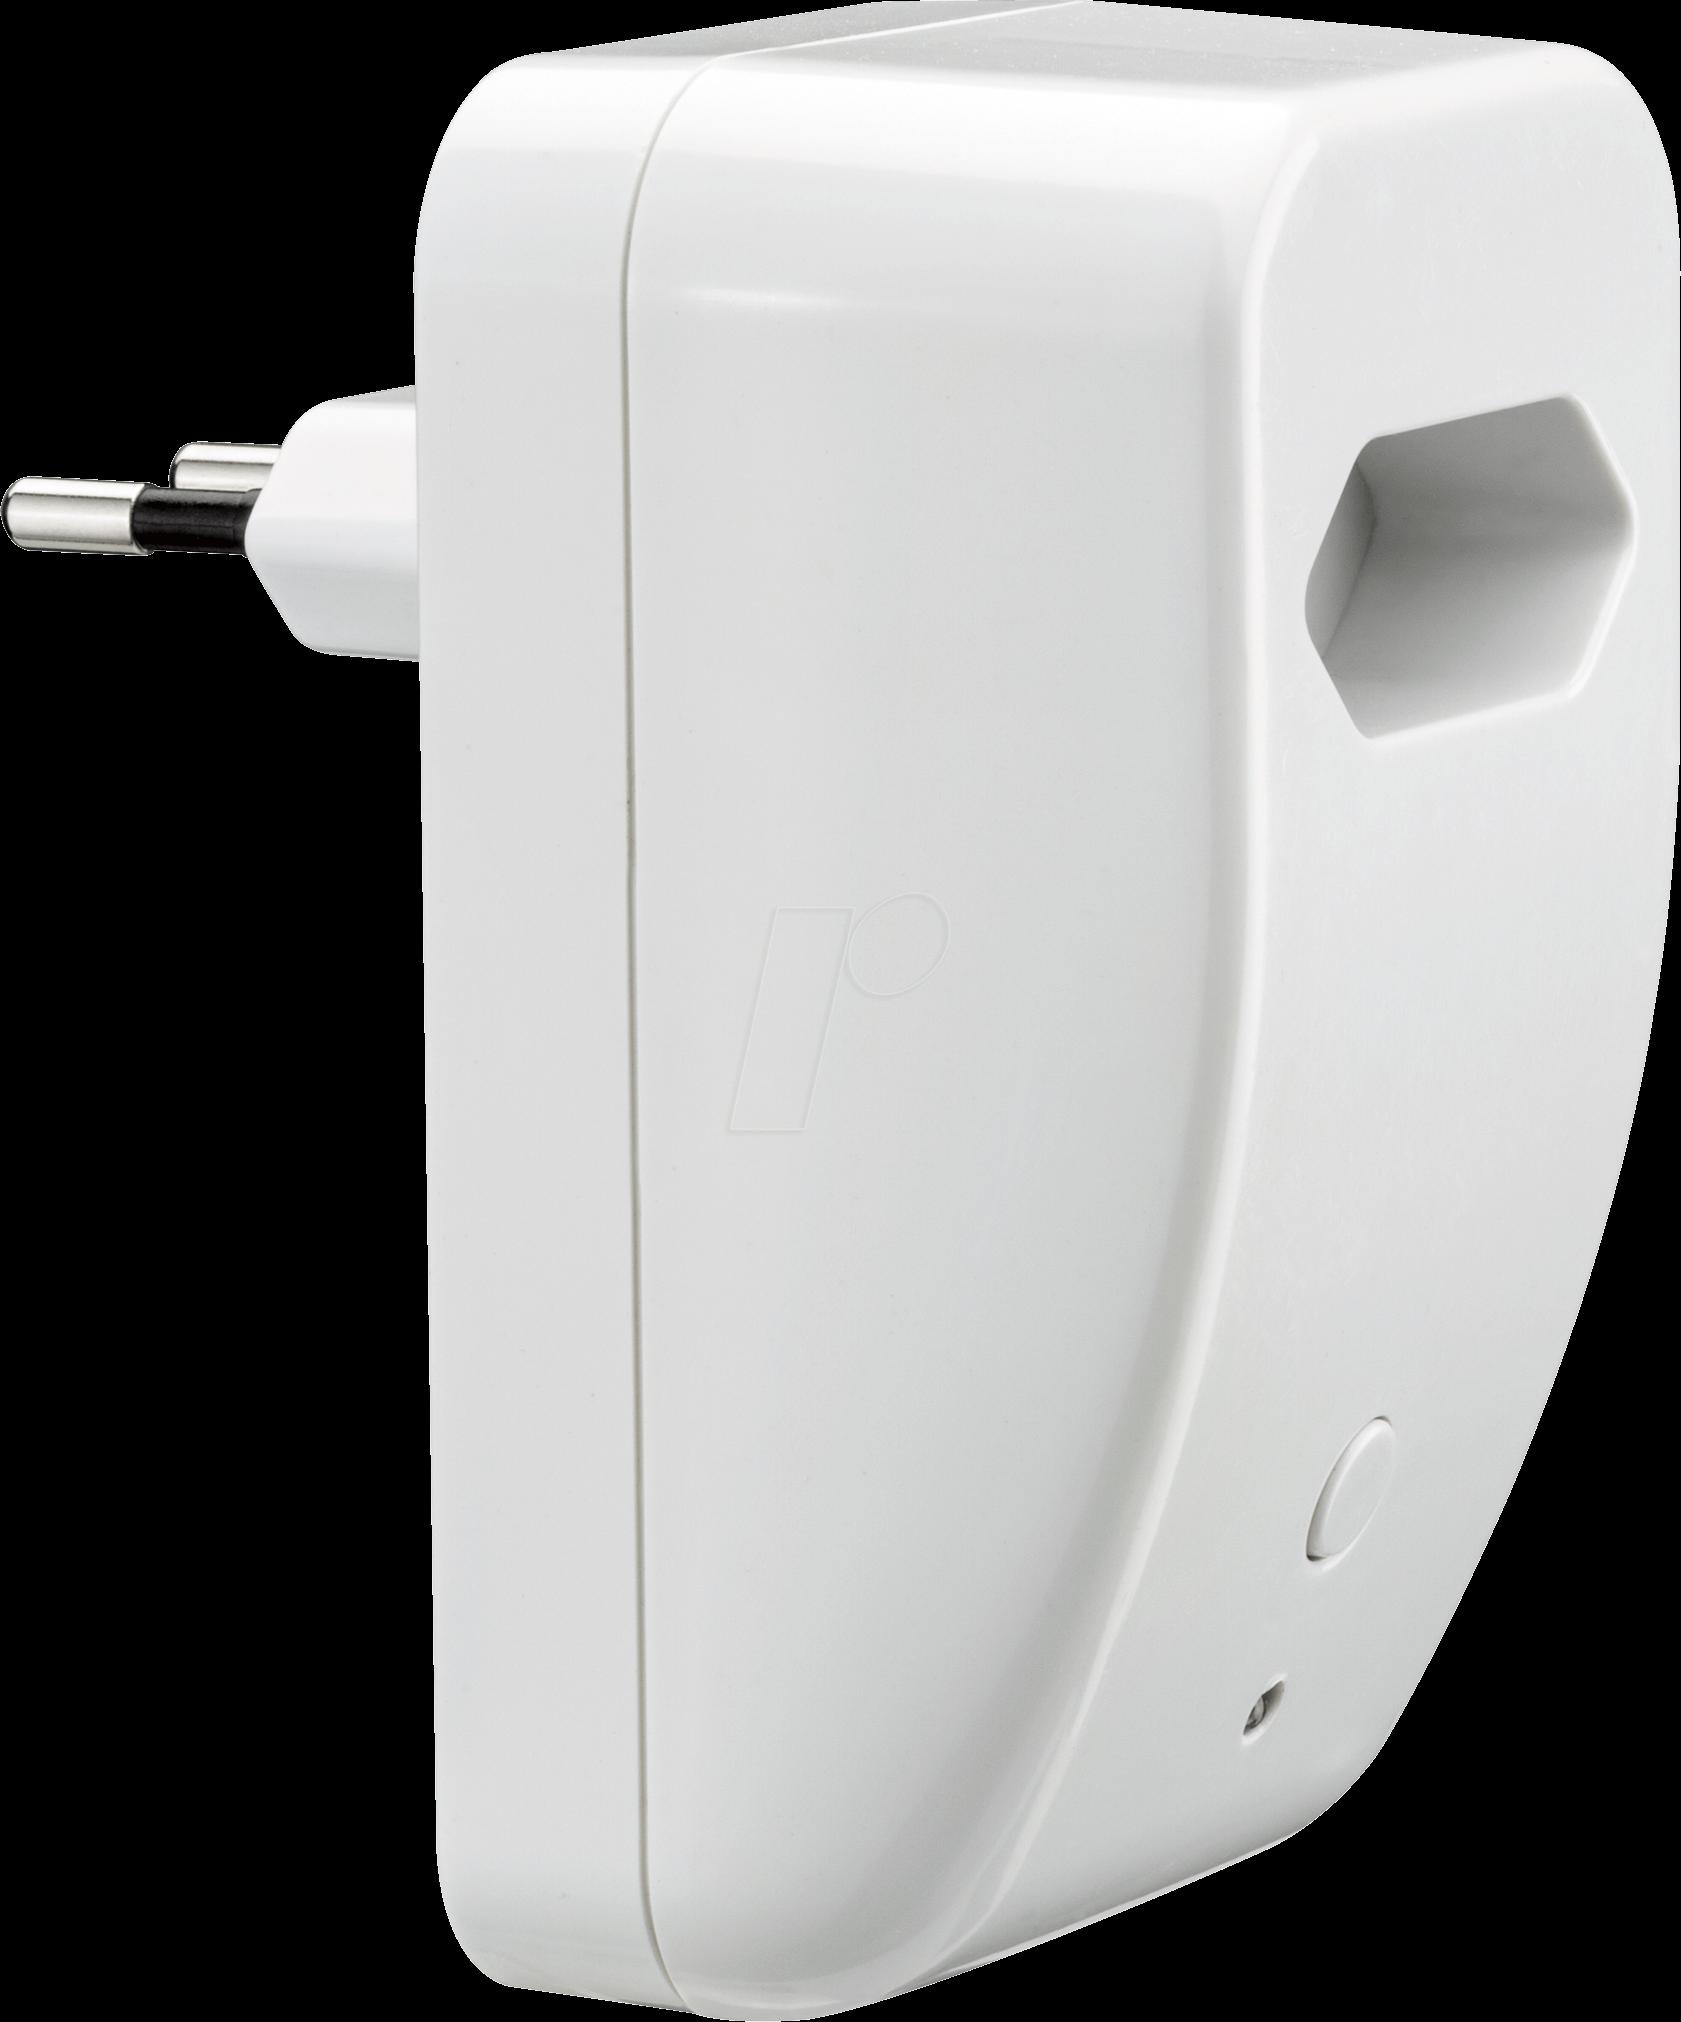 plm 50020 smart home steckdose europlug switch dimm bei reichelt elektronik. Black Bedroom Furniture Sets. Home Design Ideas